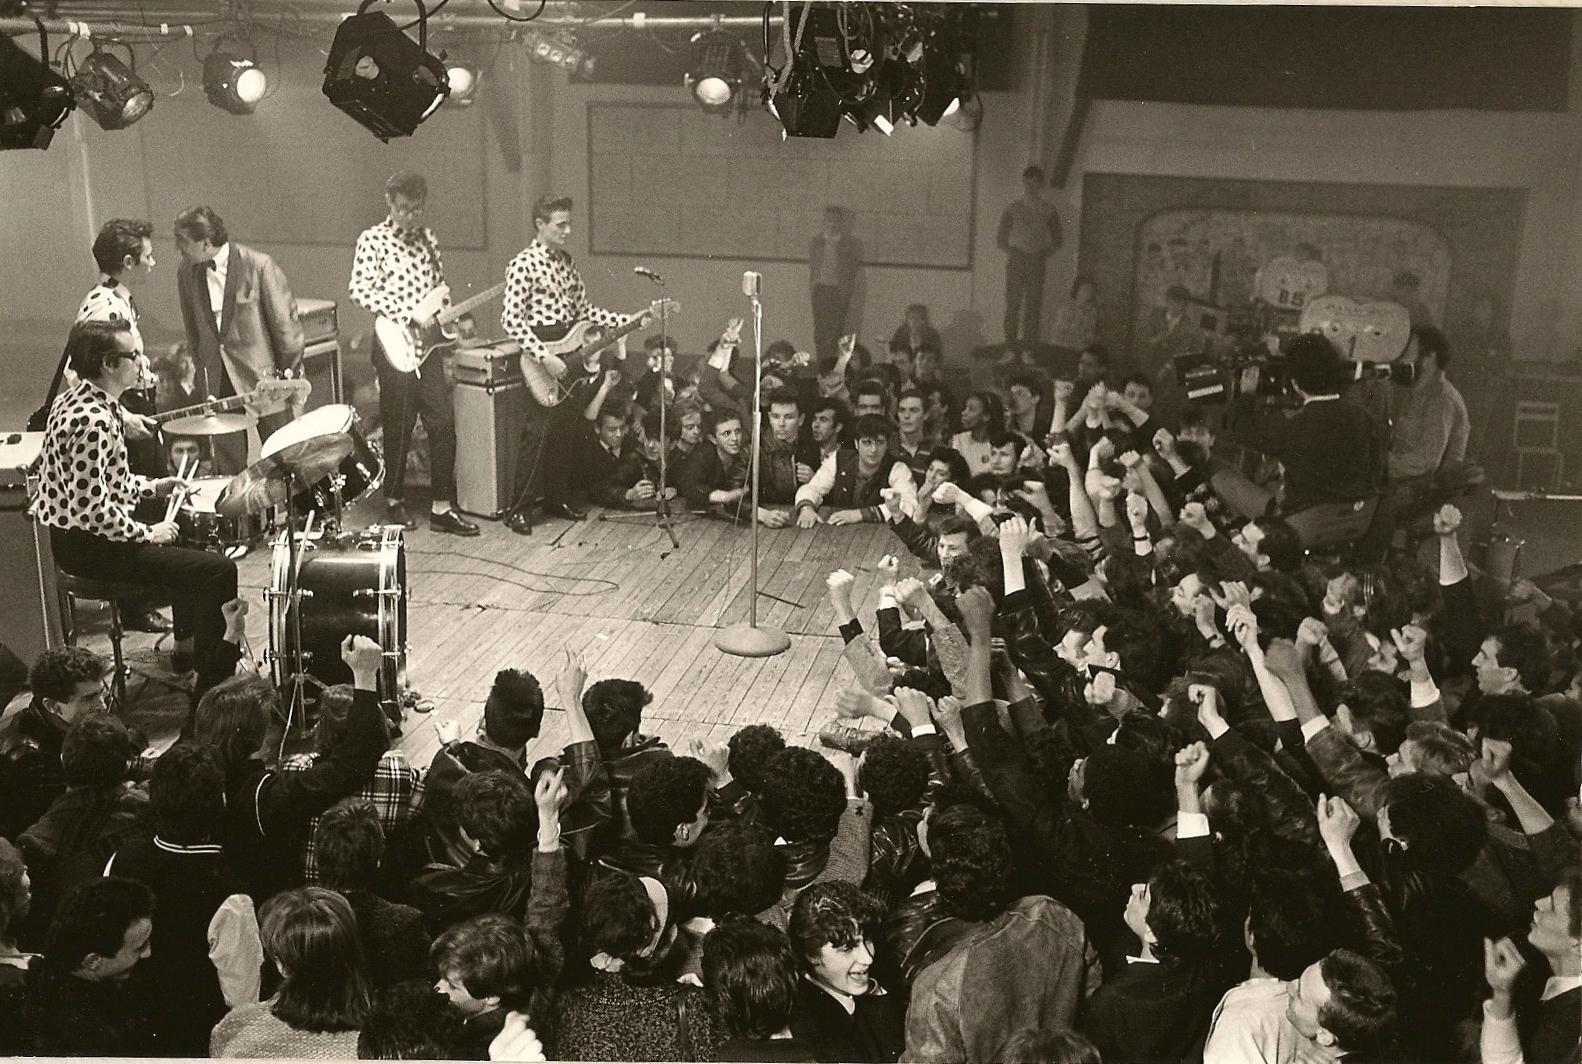 rok archives return - photo #25